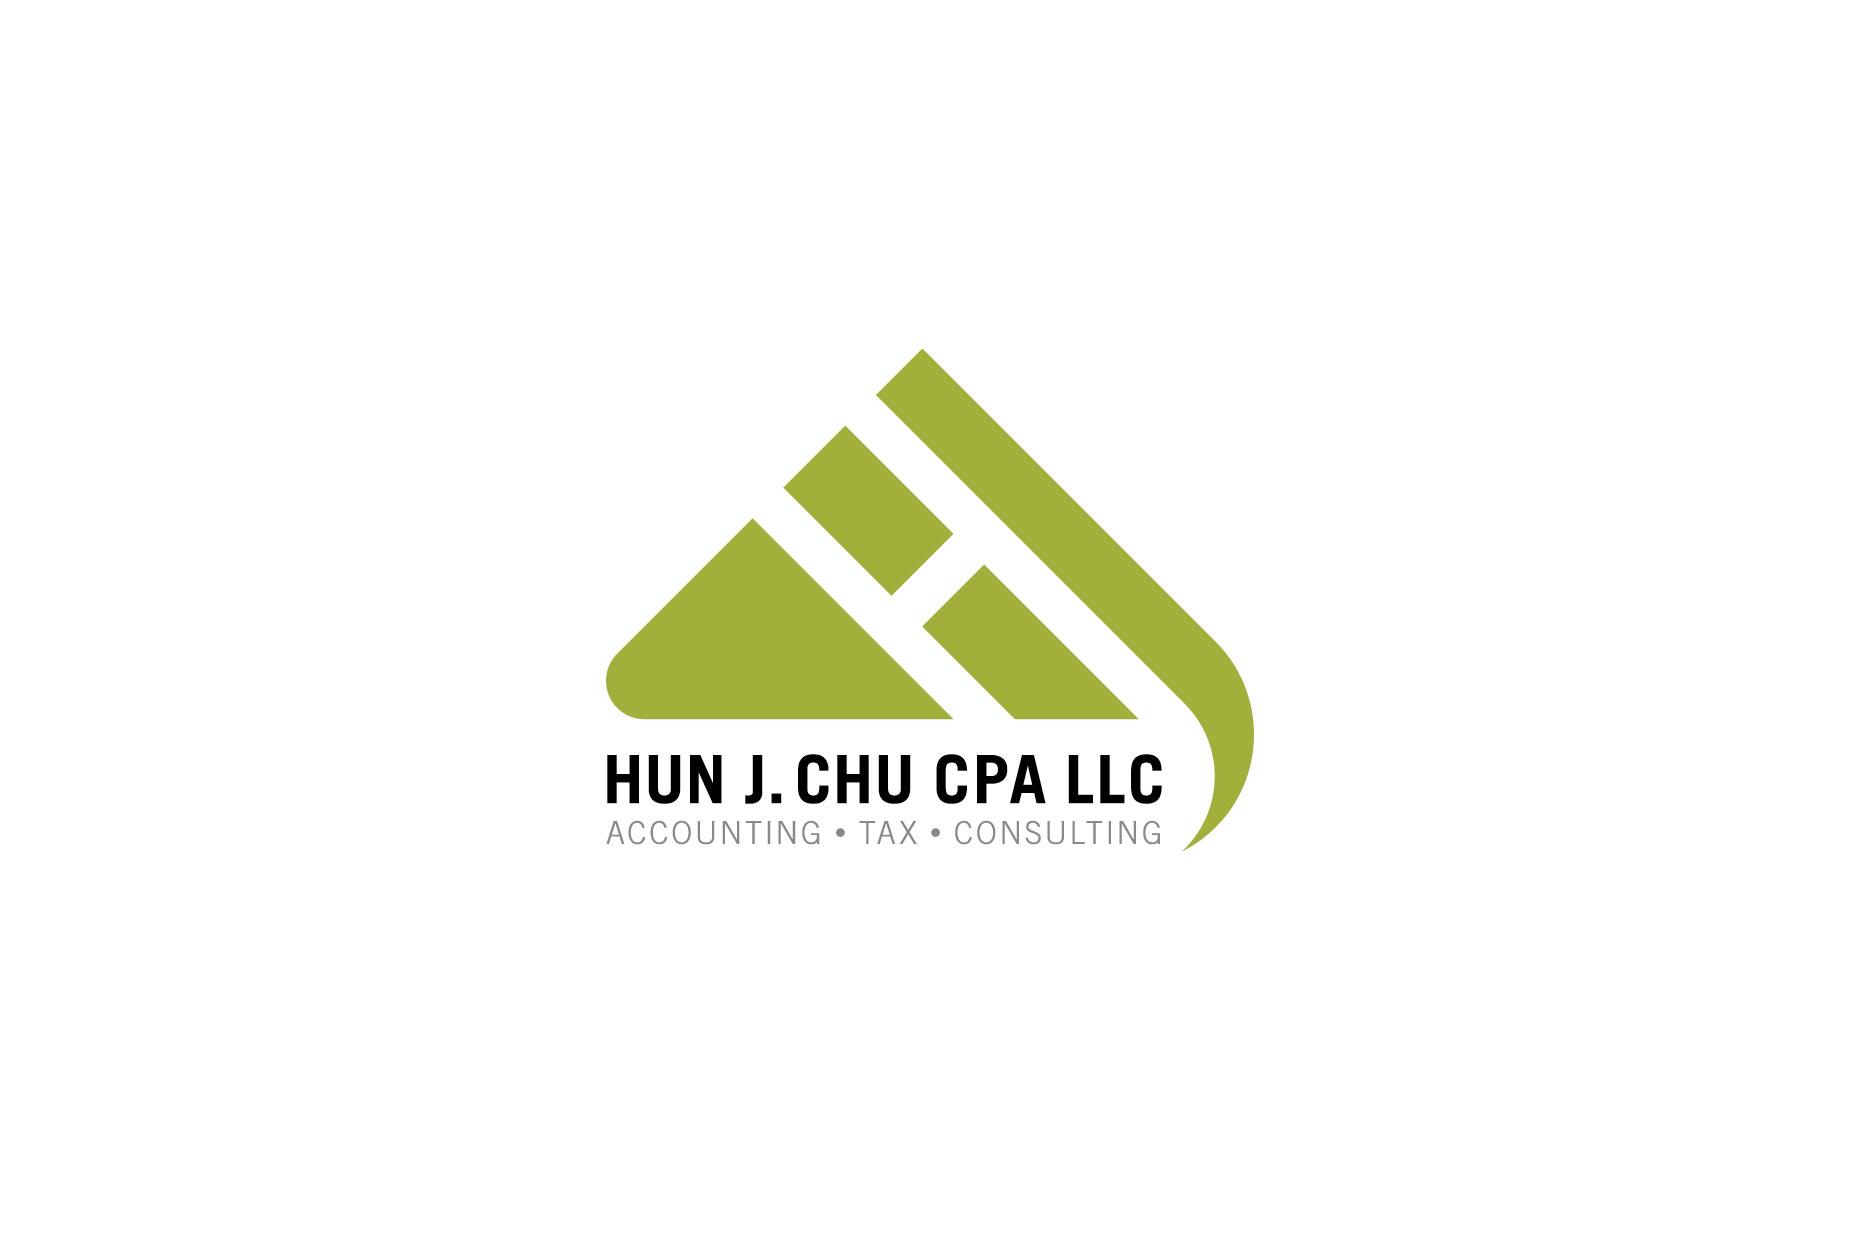 Hun J. Chu CPA LLC logo